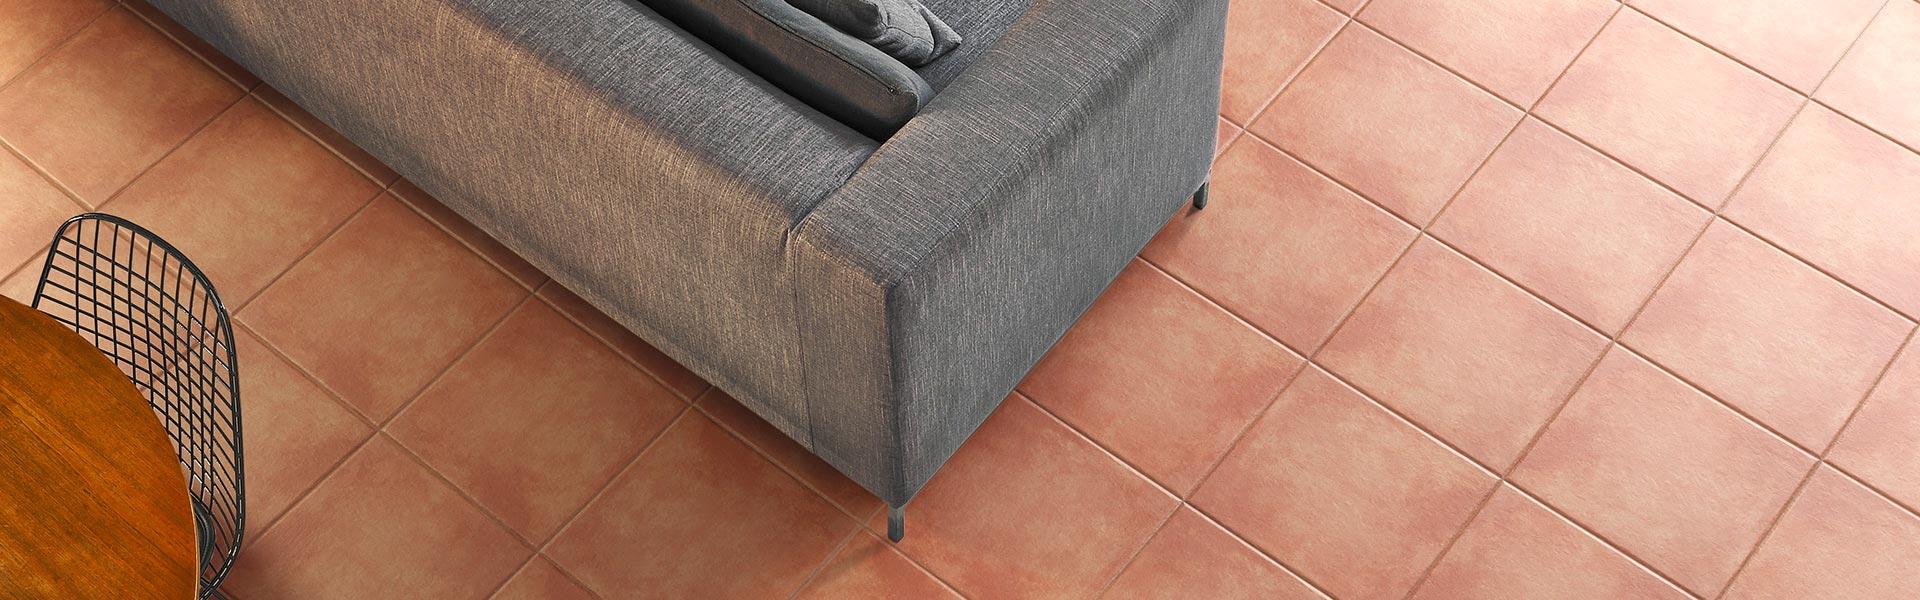 Floor Tiles Gres Rustic Effect Tiles Cotto 316x316 Vives